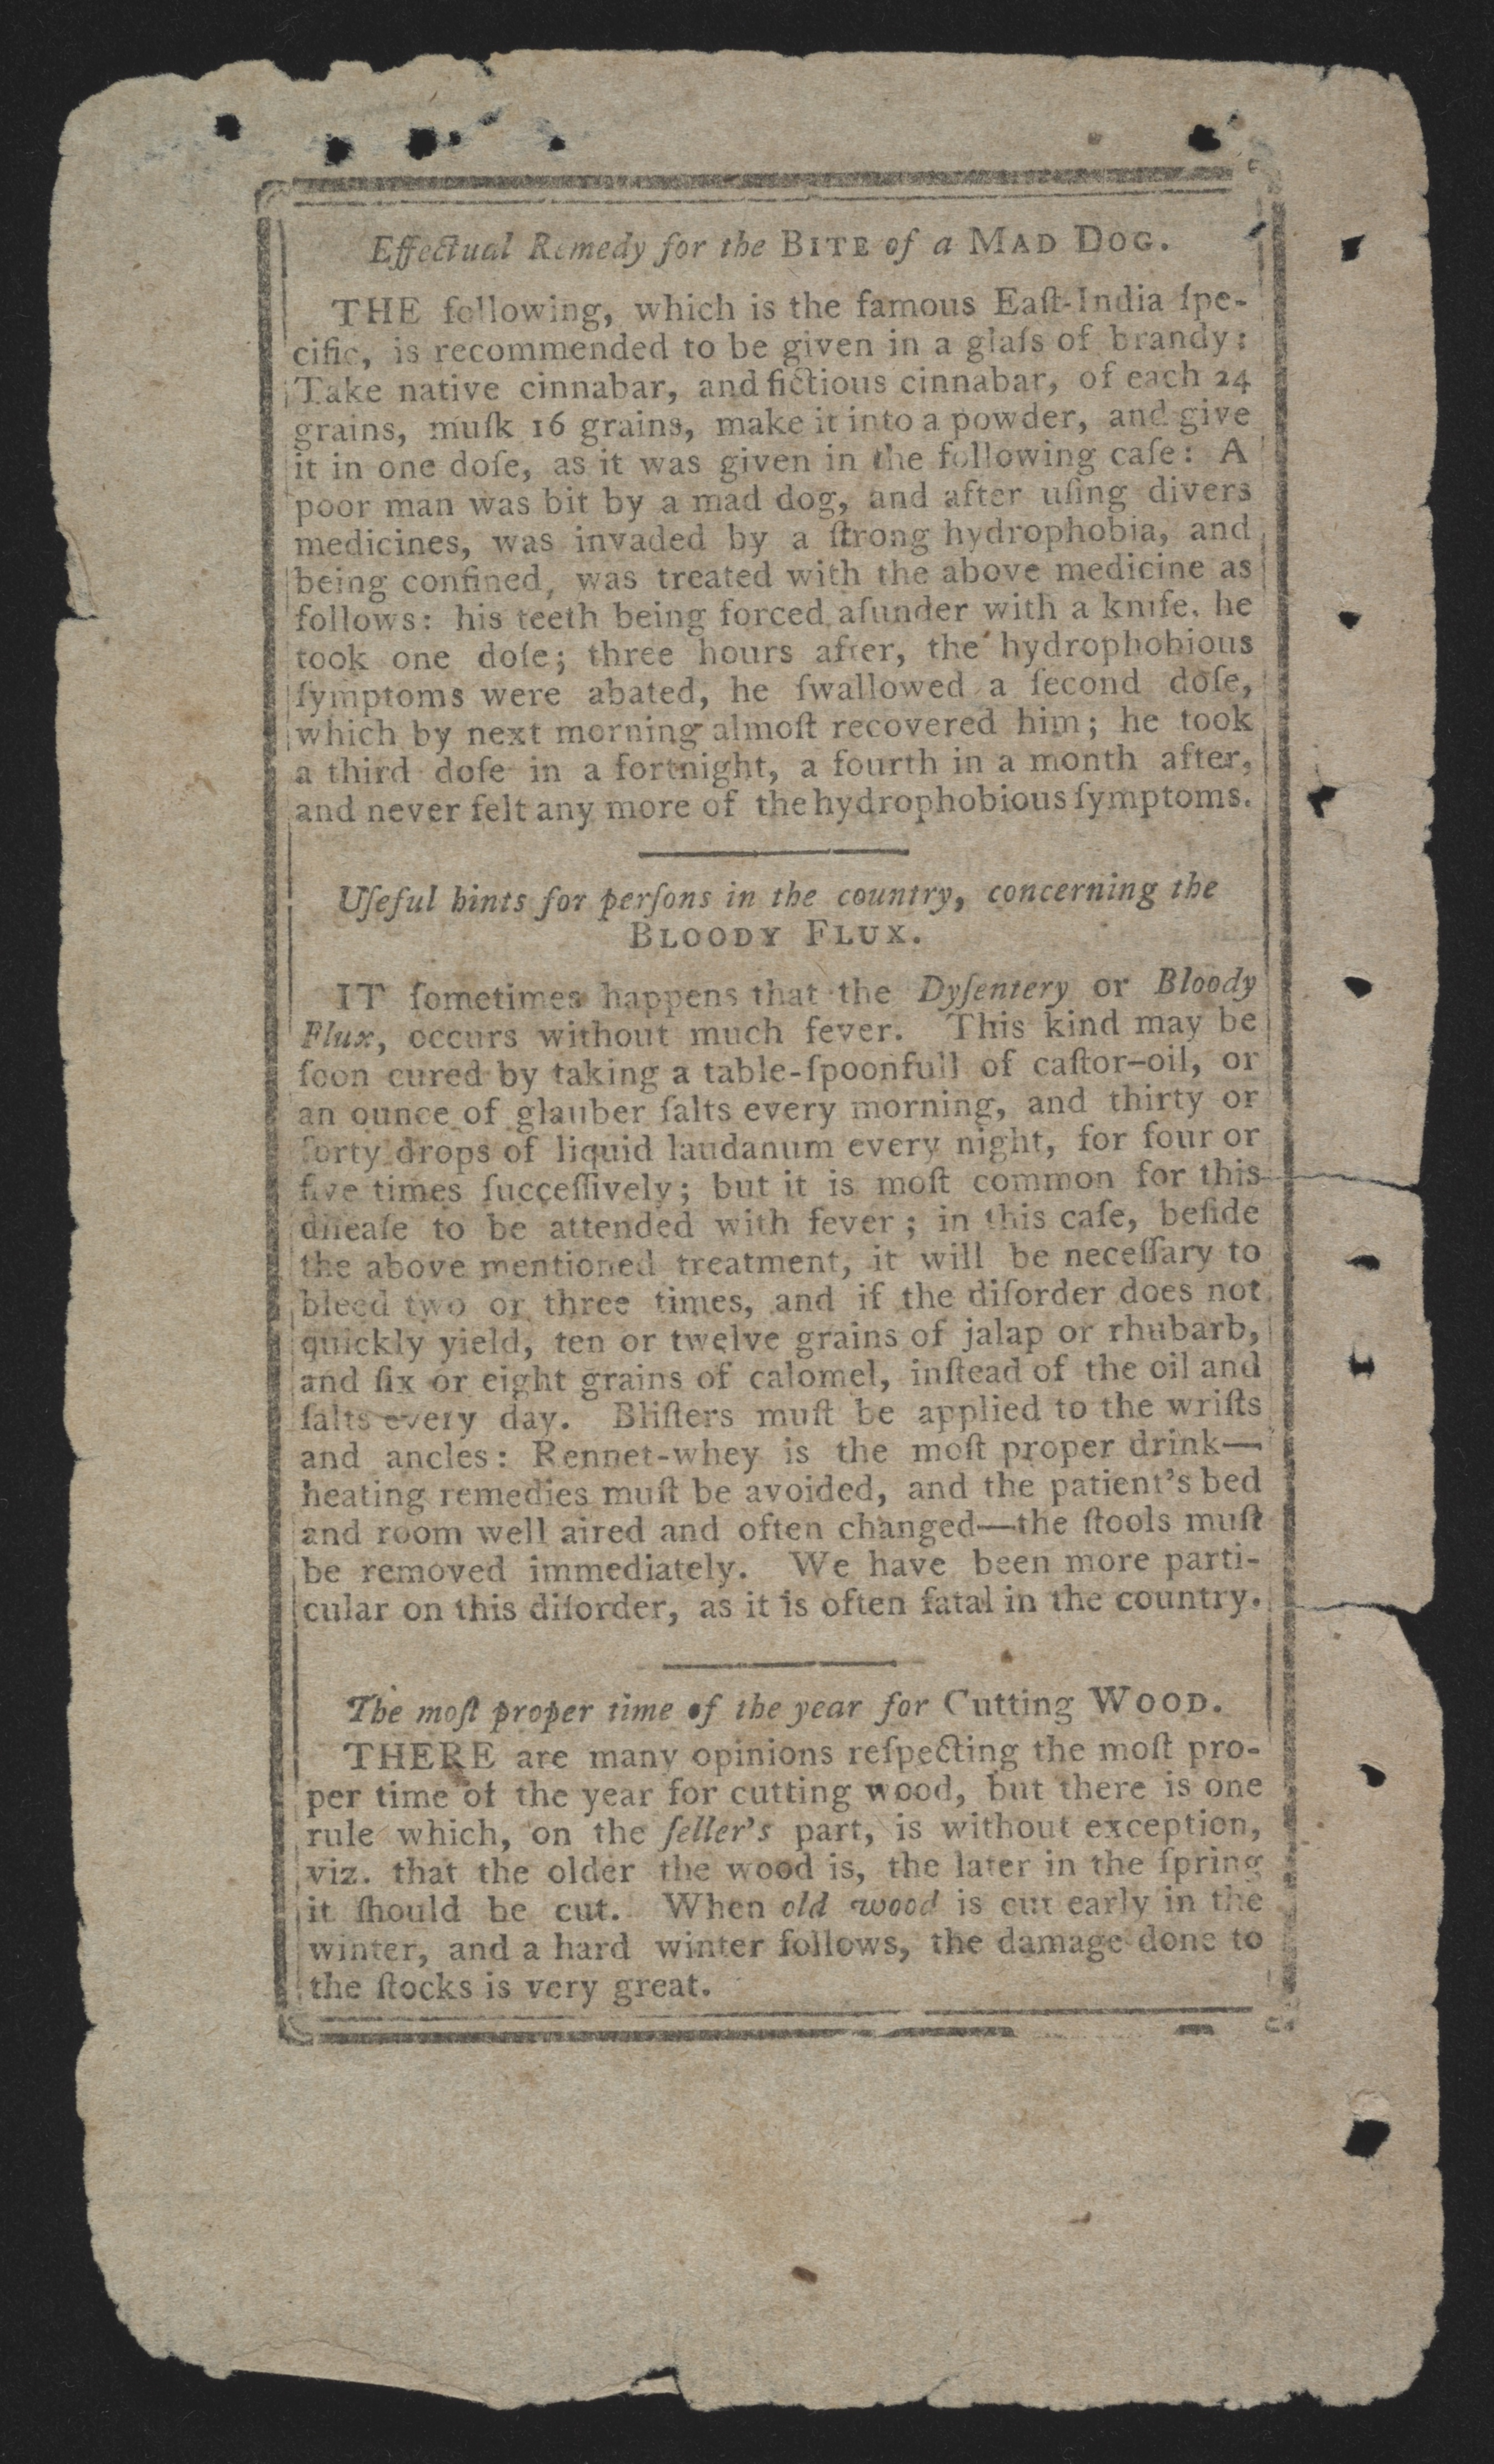 Sandy Island Plantation Journal, Volume 2, 1797, Page 49